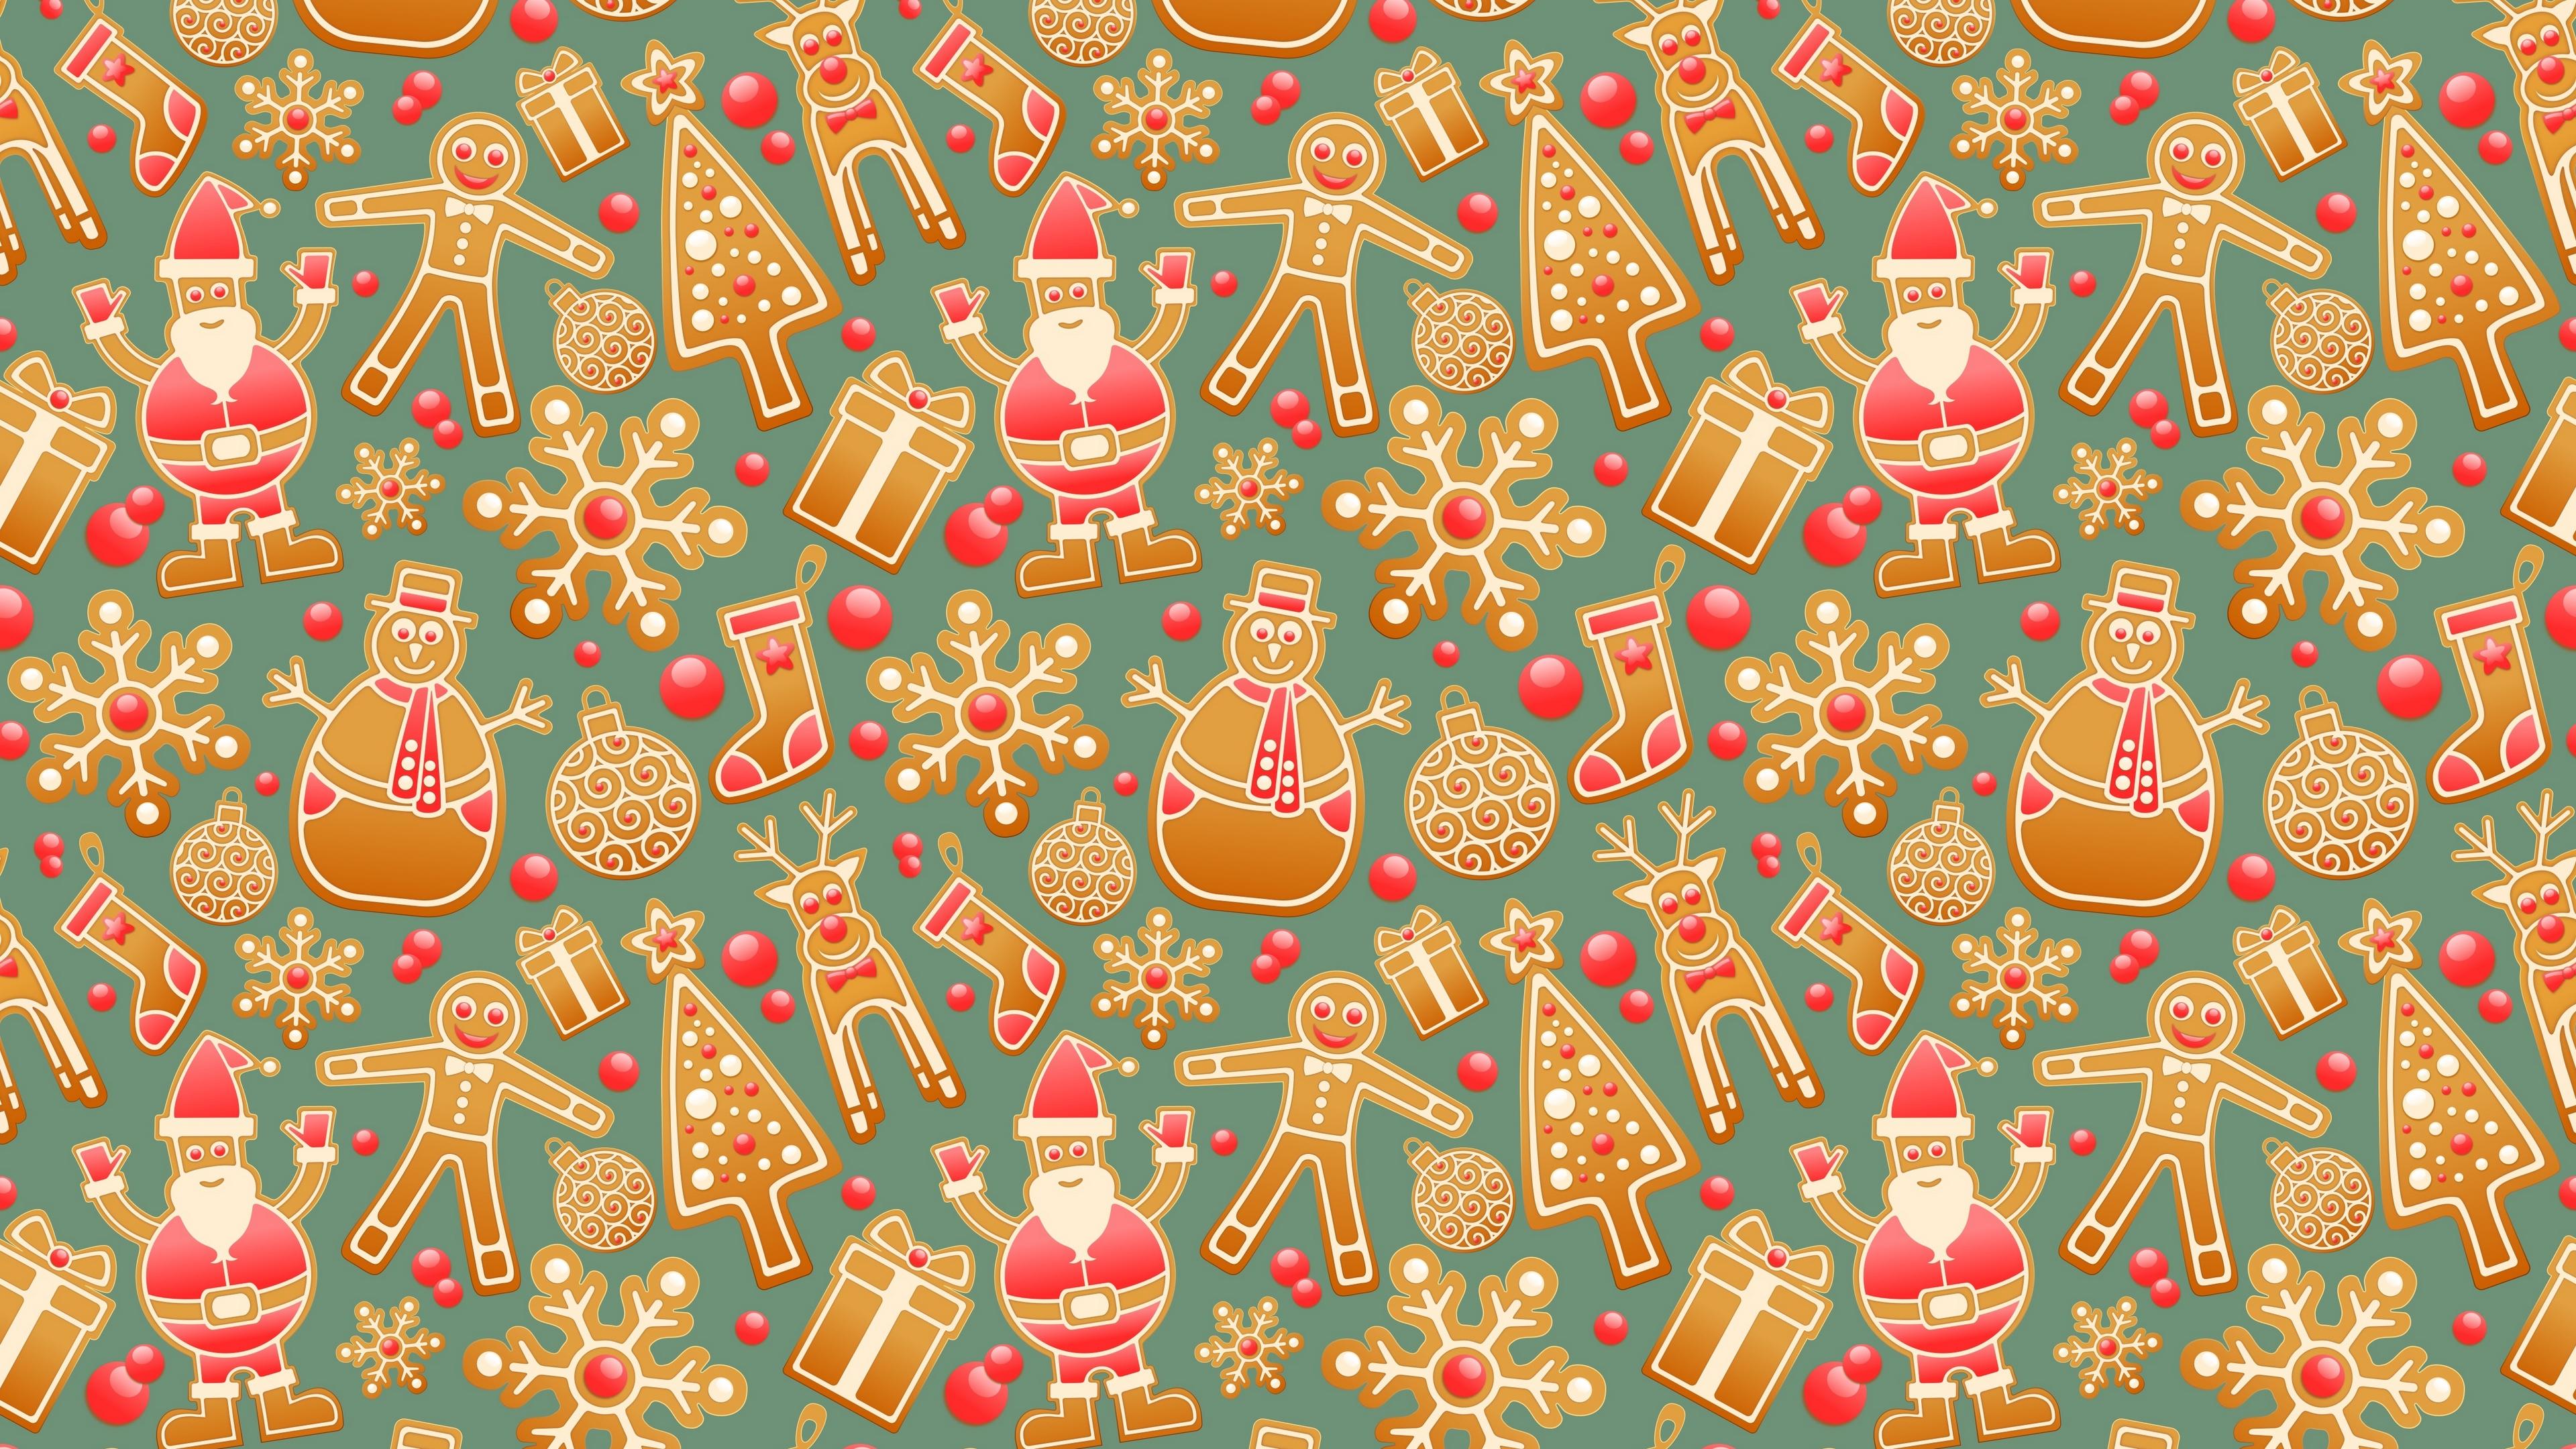 christmas new year gingerbread snowman santa claus 4k 1538345171 - christmas, new year, gingerbread, snowman, santa claus 4k - new year, gingerbread, Christmas